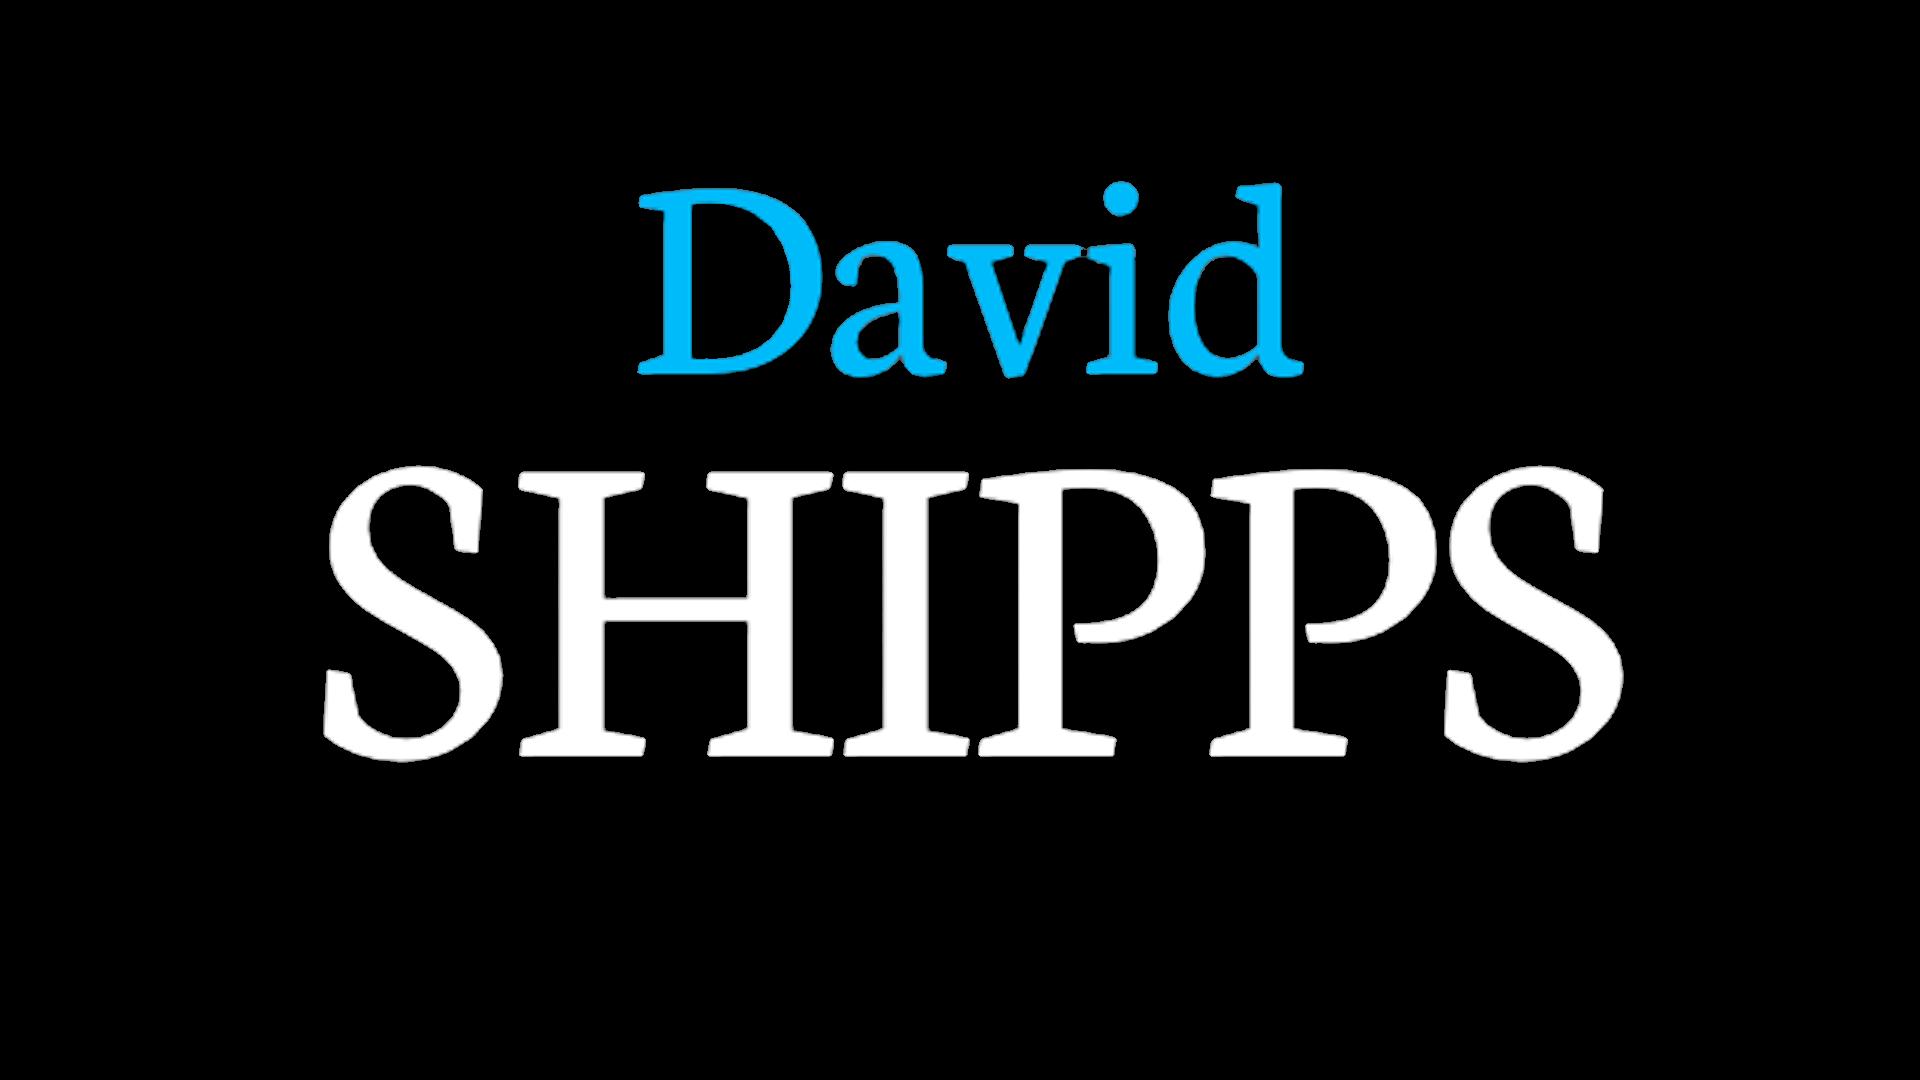 DAVID SHIPPS.png